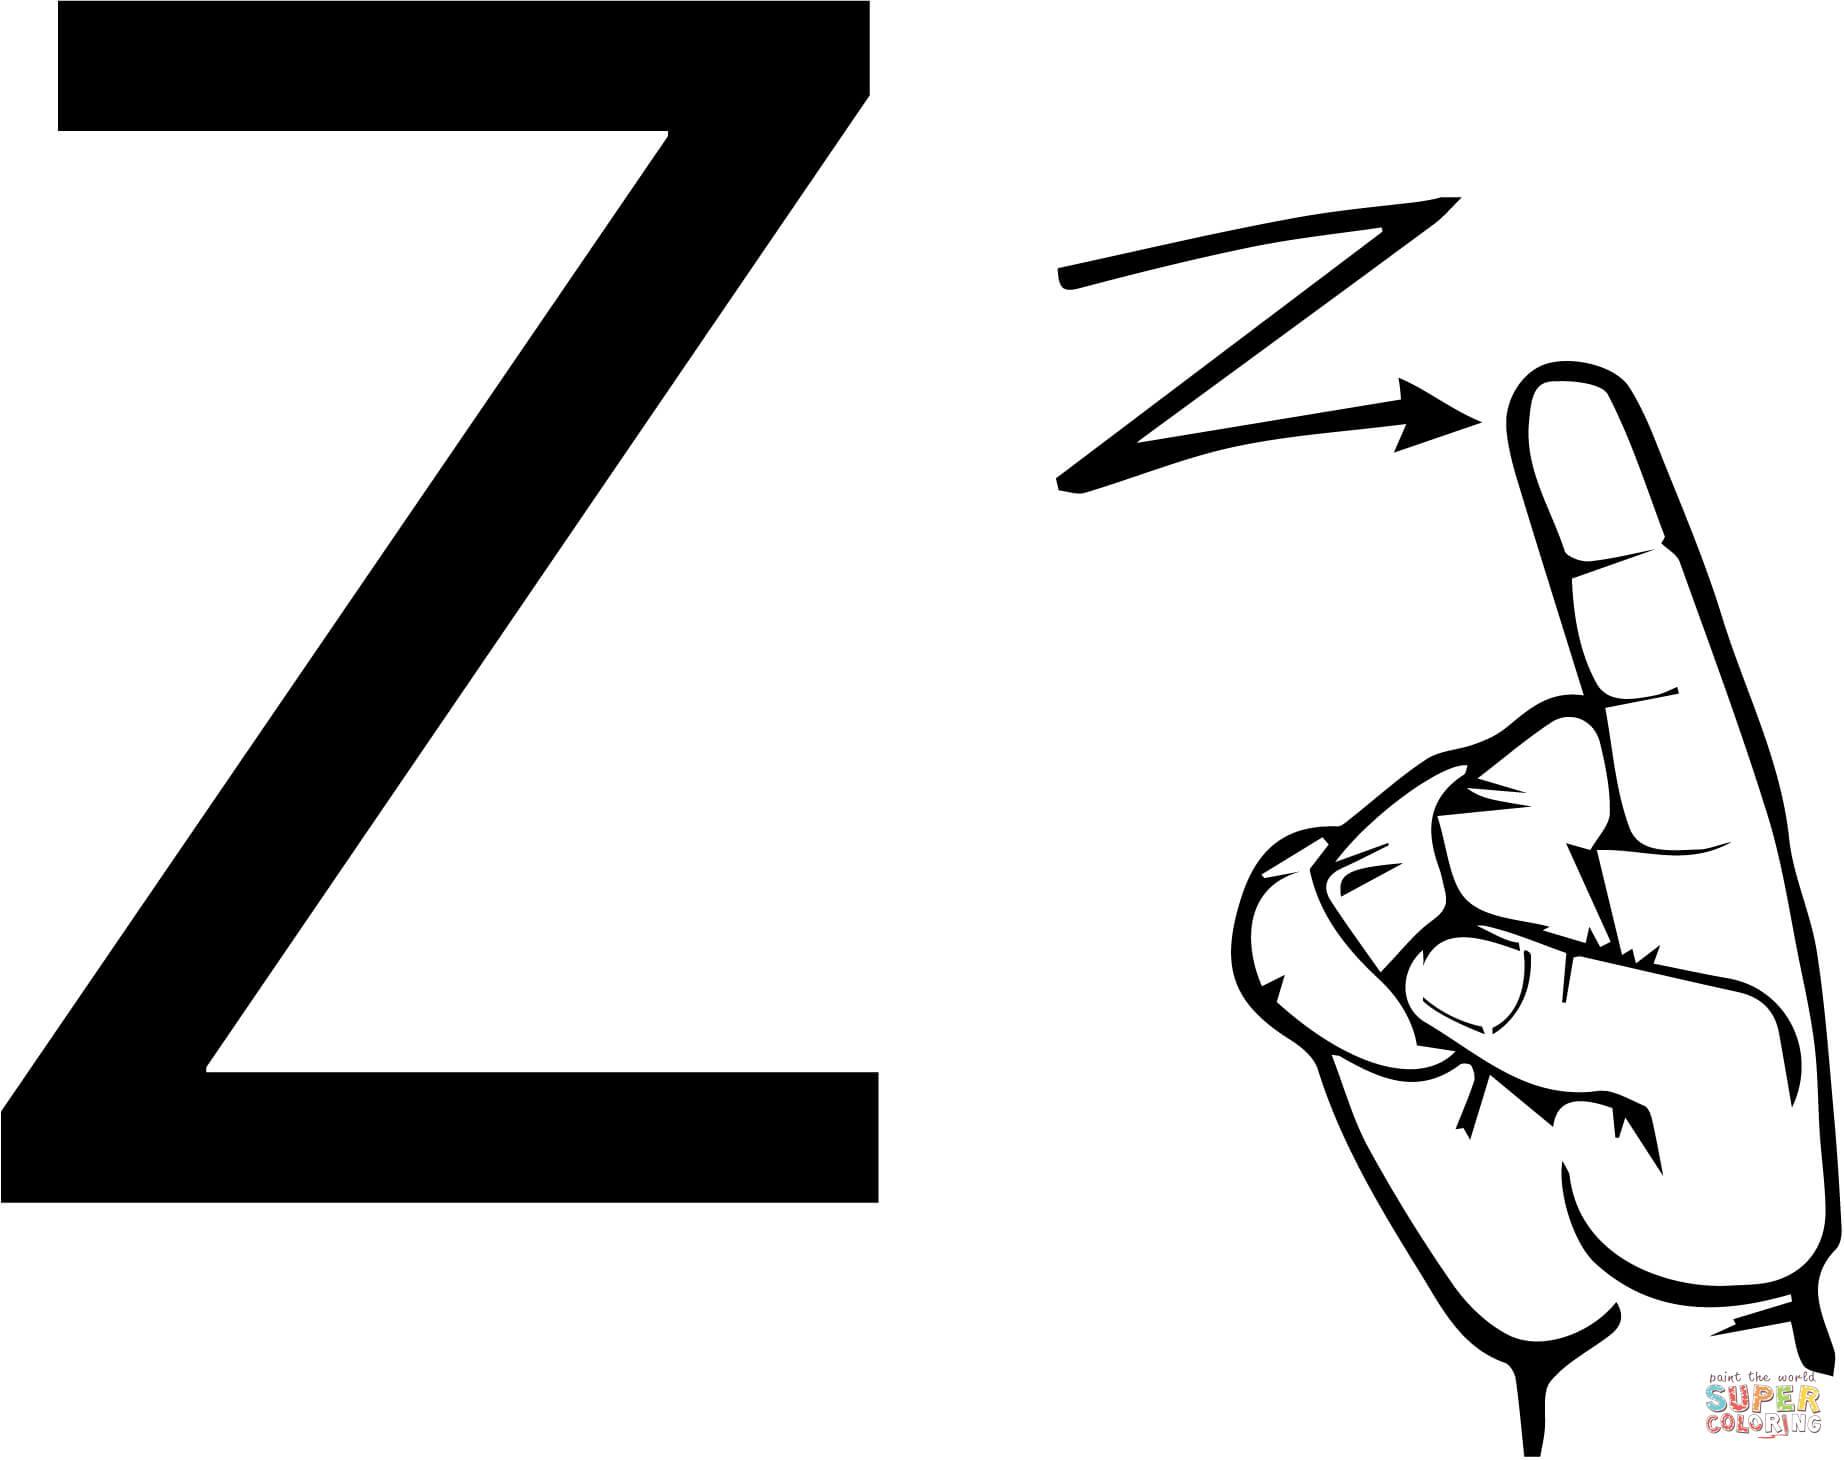 Asl Sign Language Letter Z Coloring Page